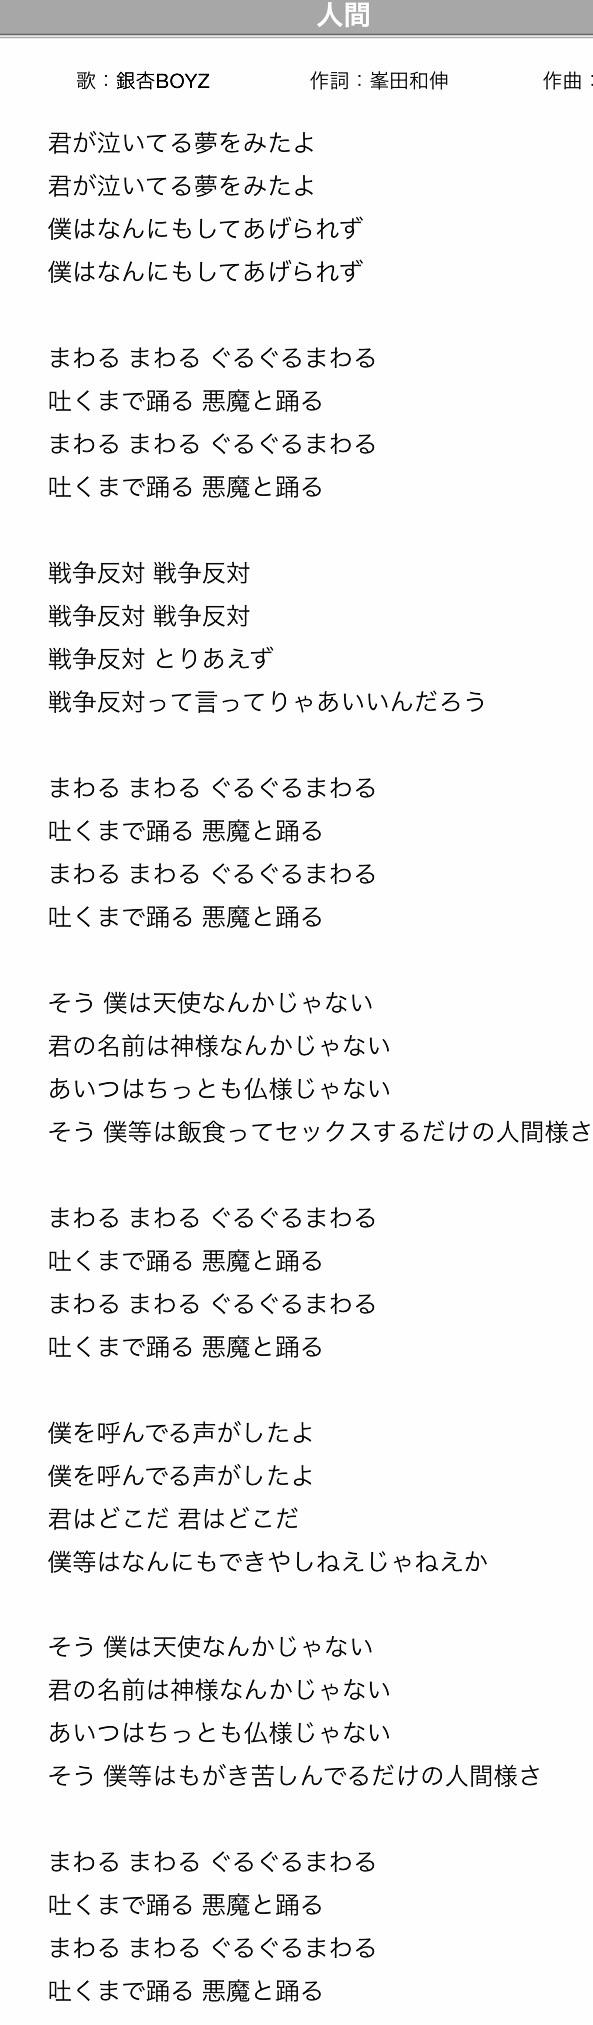 f:id:mushimushi06:20170308001110j:image